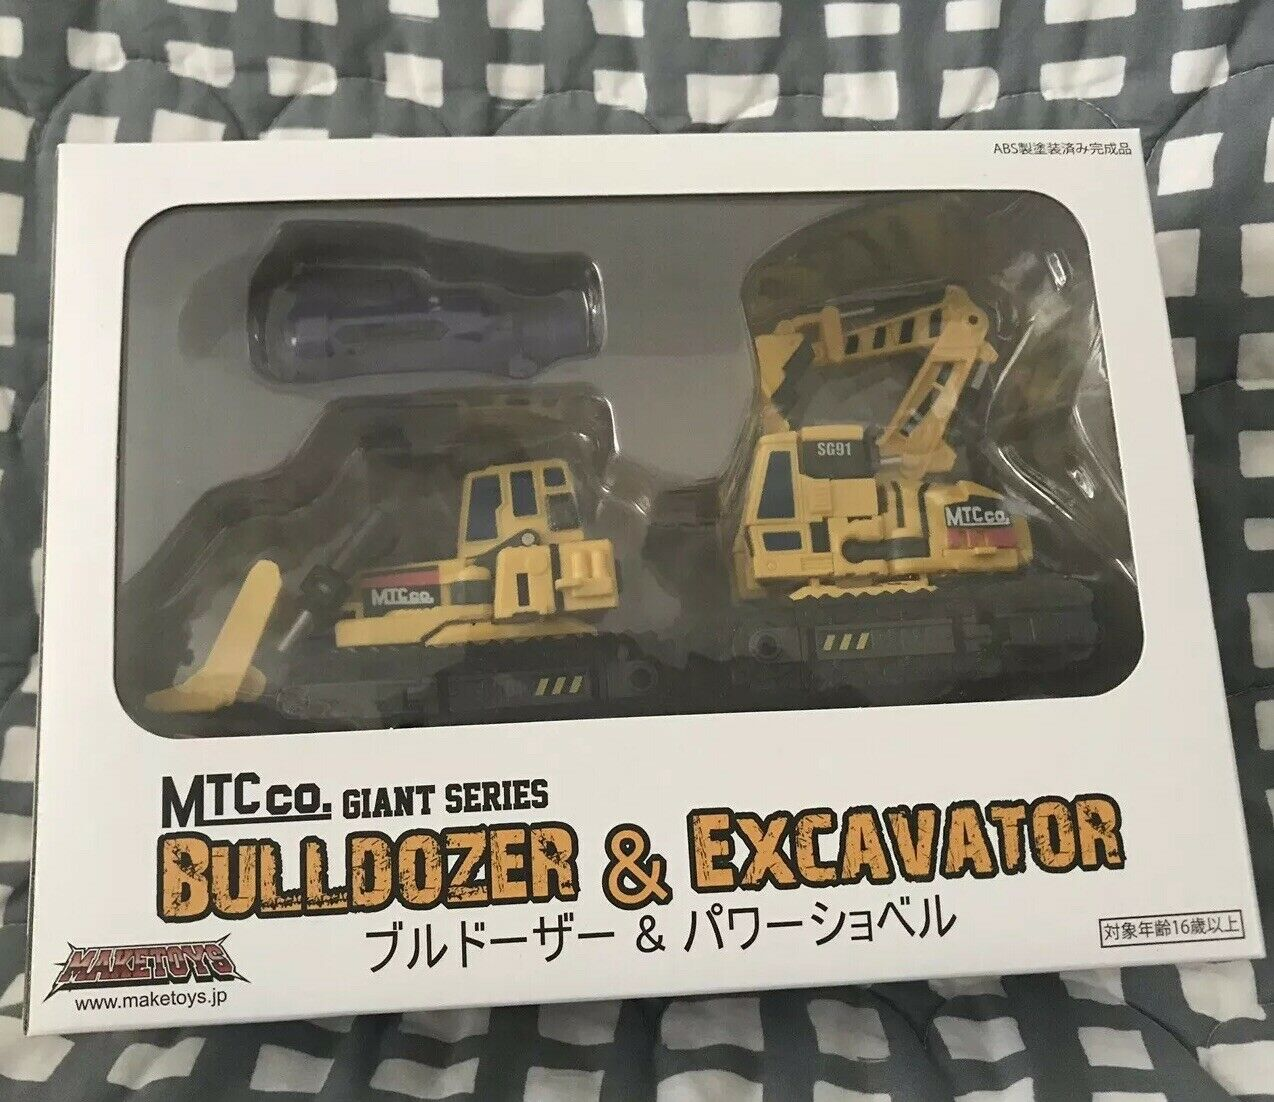 Transformers 3rd Fiesta hacer juguetes Excavadora Bulldozer giallo G1 máquina pistolas Devastator WFC